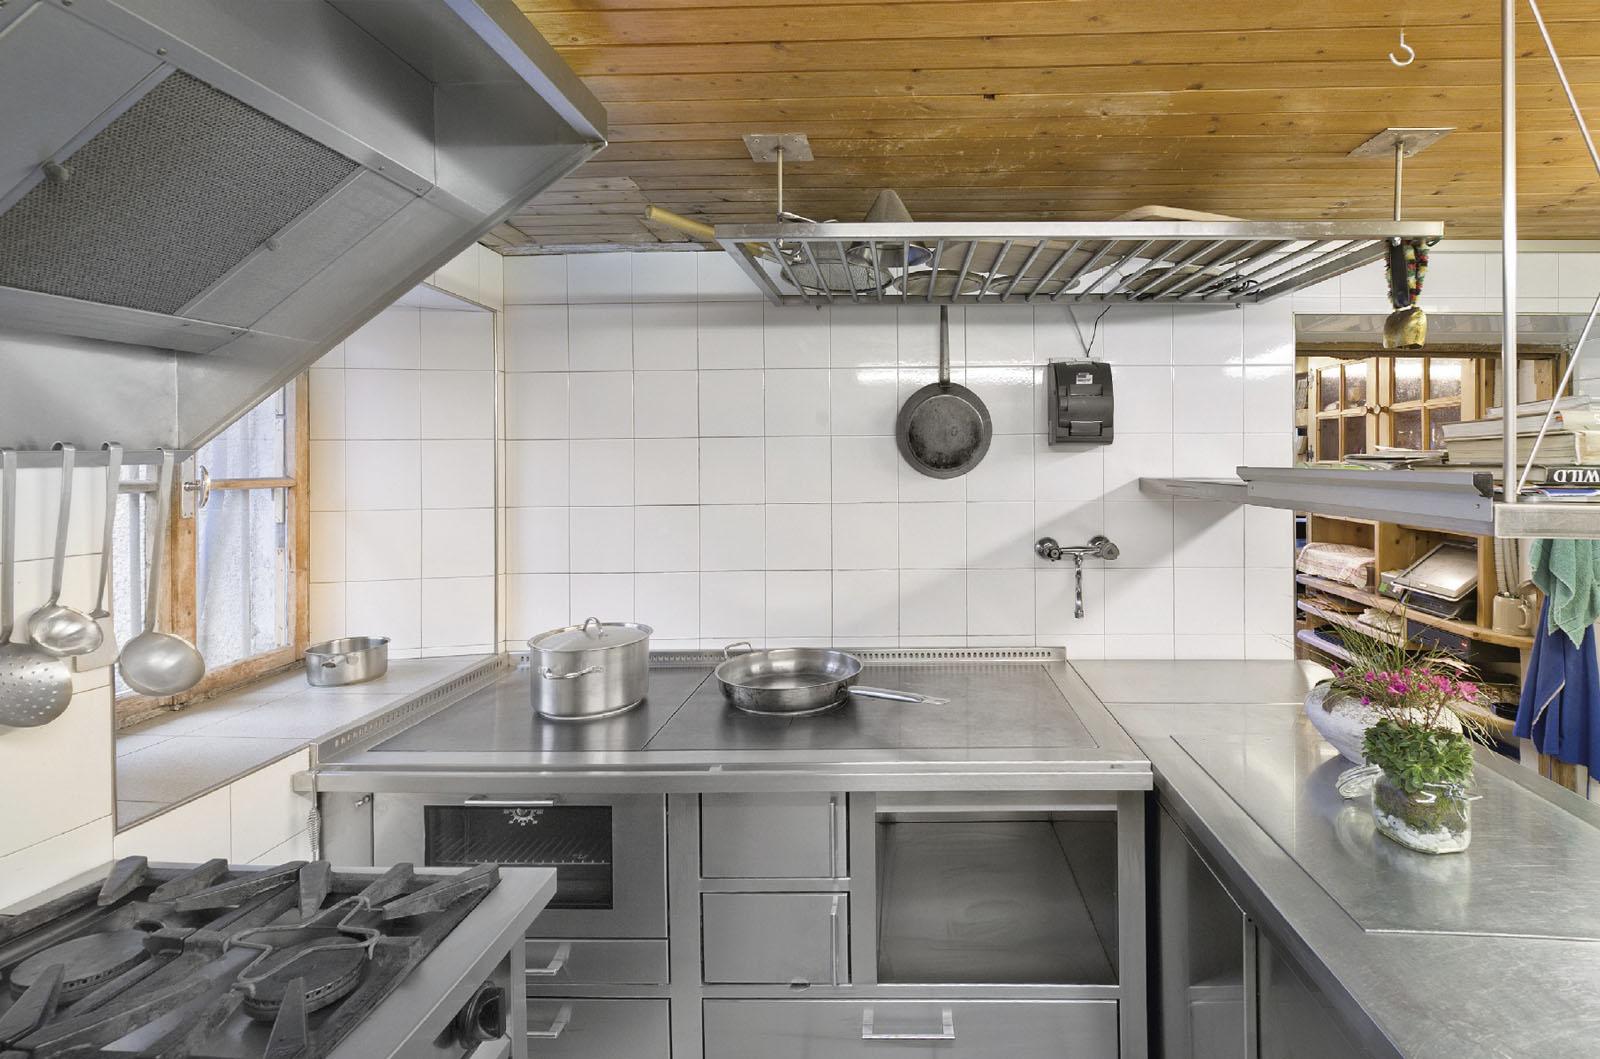 Termocucine cucine a legna cucine economiche a legna for Cucine pertinger